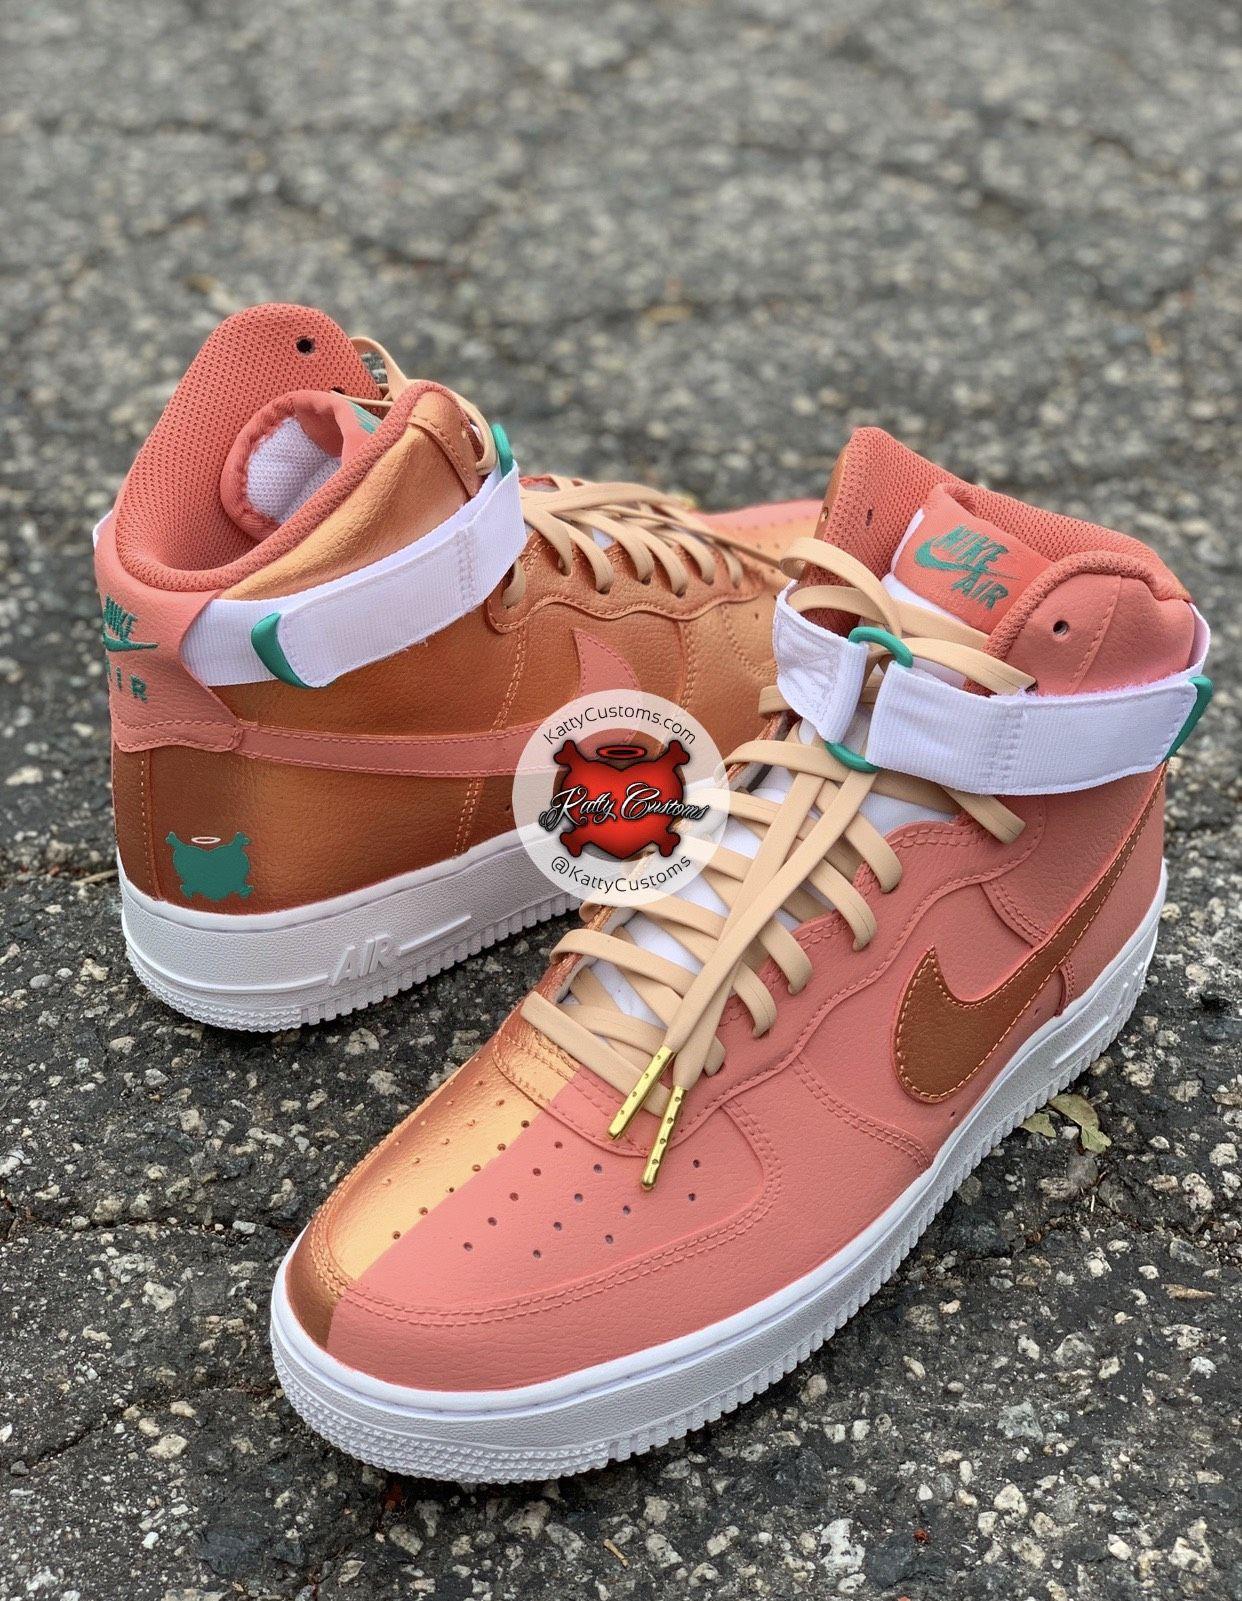 Custom Nike Sneakers - Katty Customs in